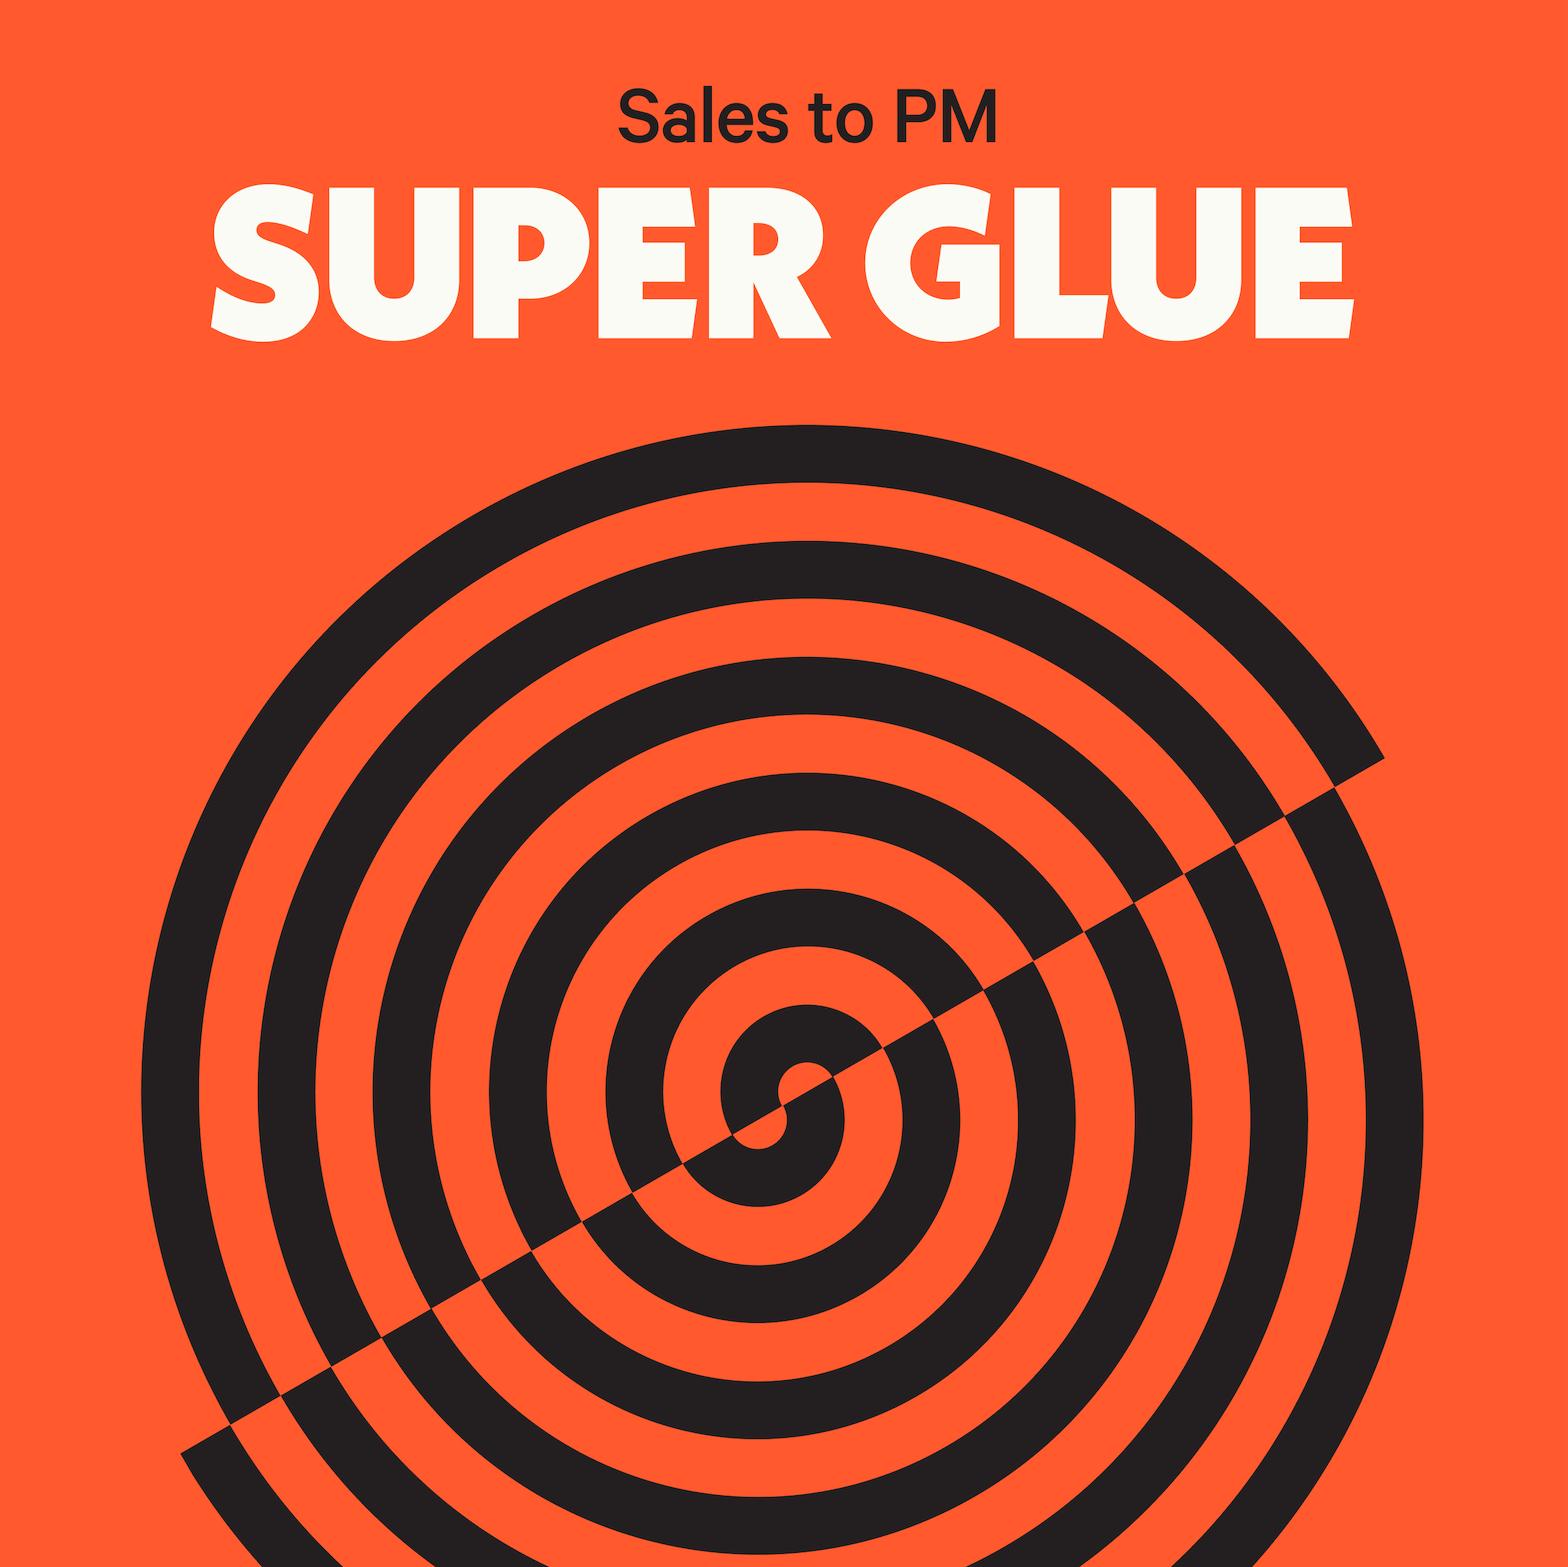 Sales to PM Super Glue course cover